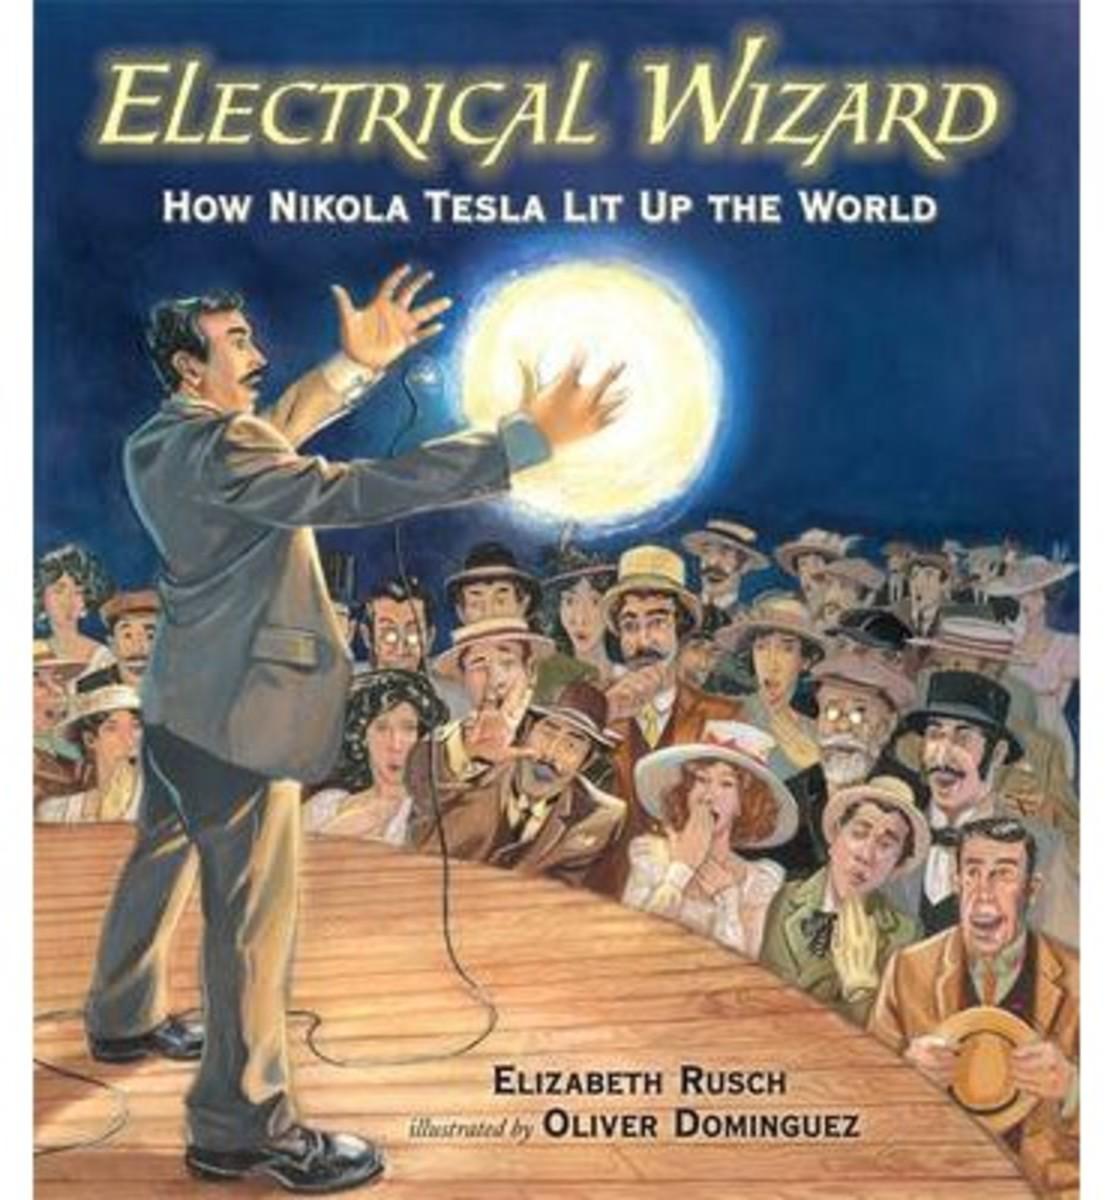 Electrical Wizard: How Nikola Tesla Lit Up the World by Elizabeth Rusch